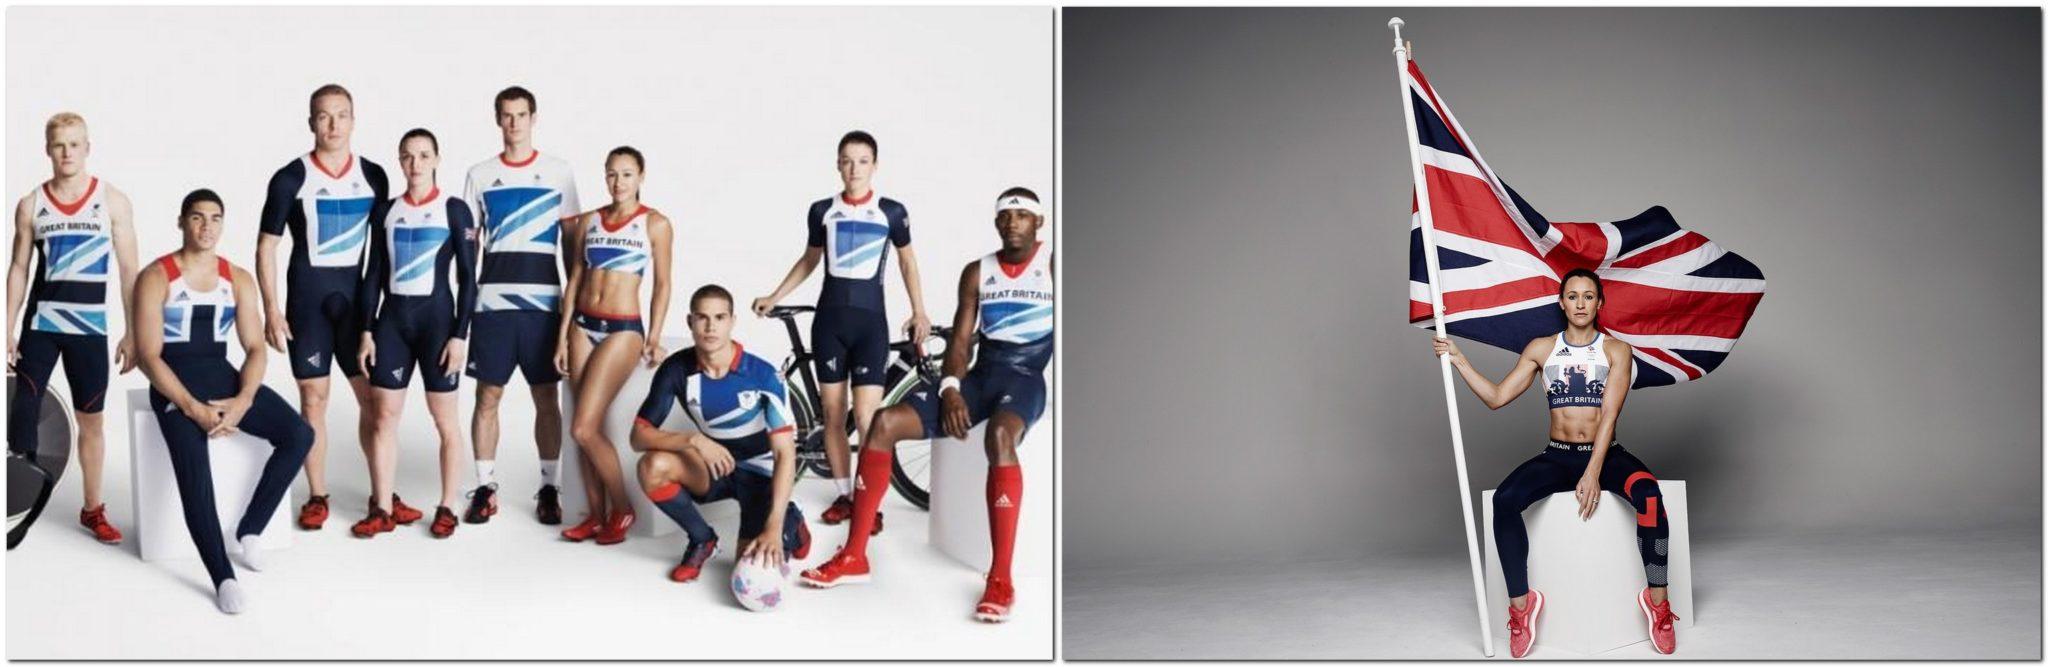 UK Olympic Team